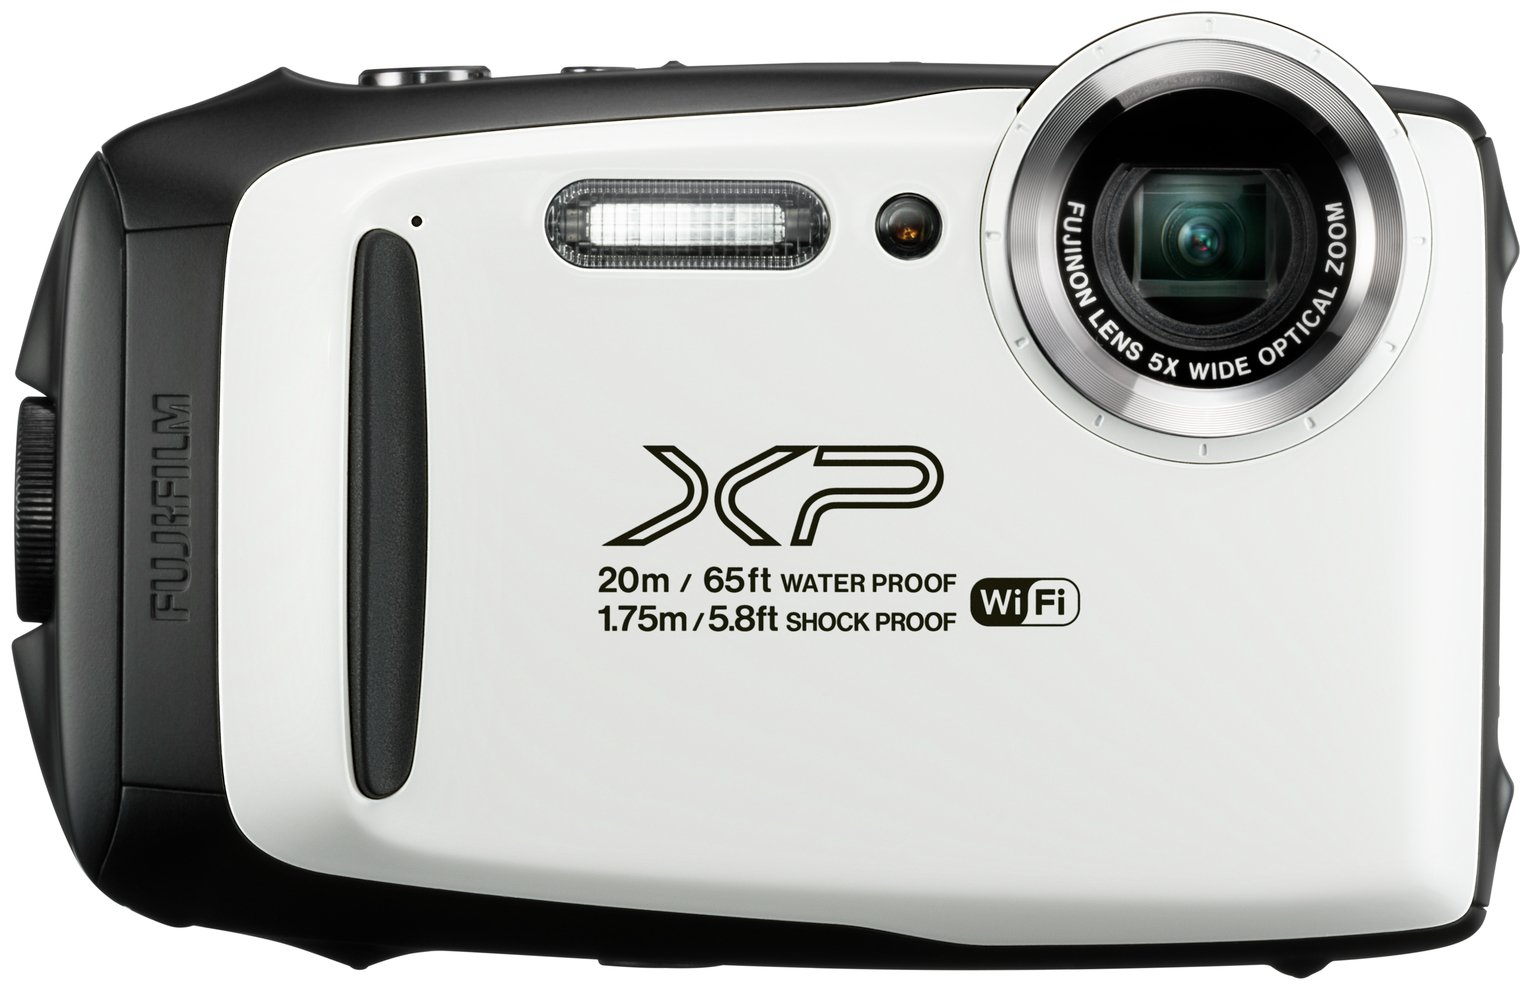 Image of Fujifilm FinePix XP130 16.4MP Waterproof Camera - White